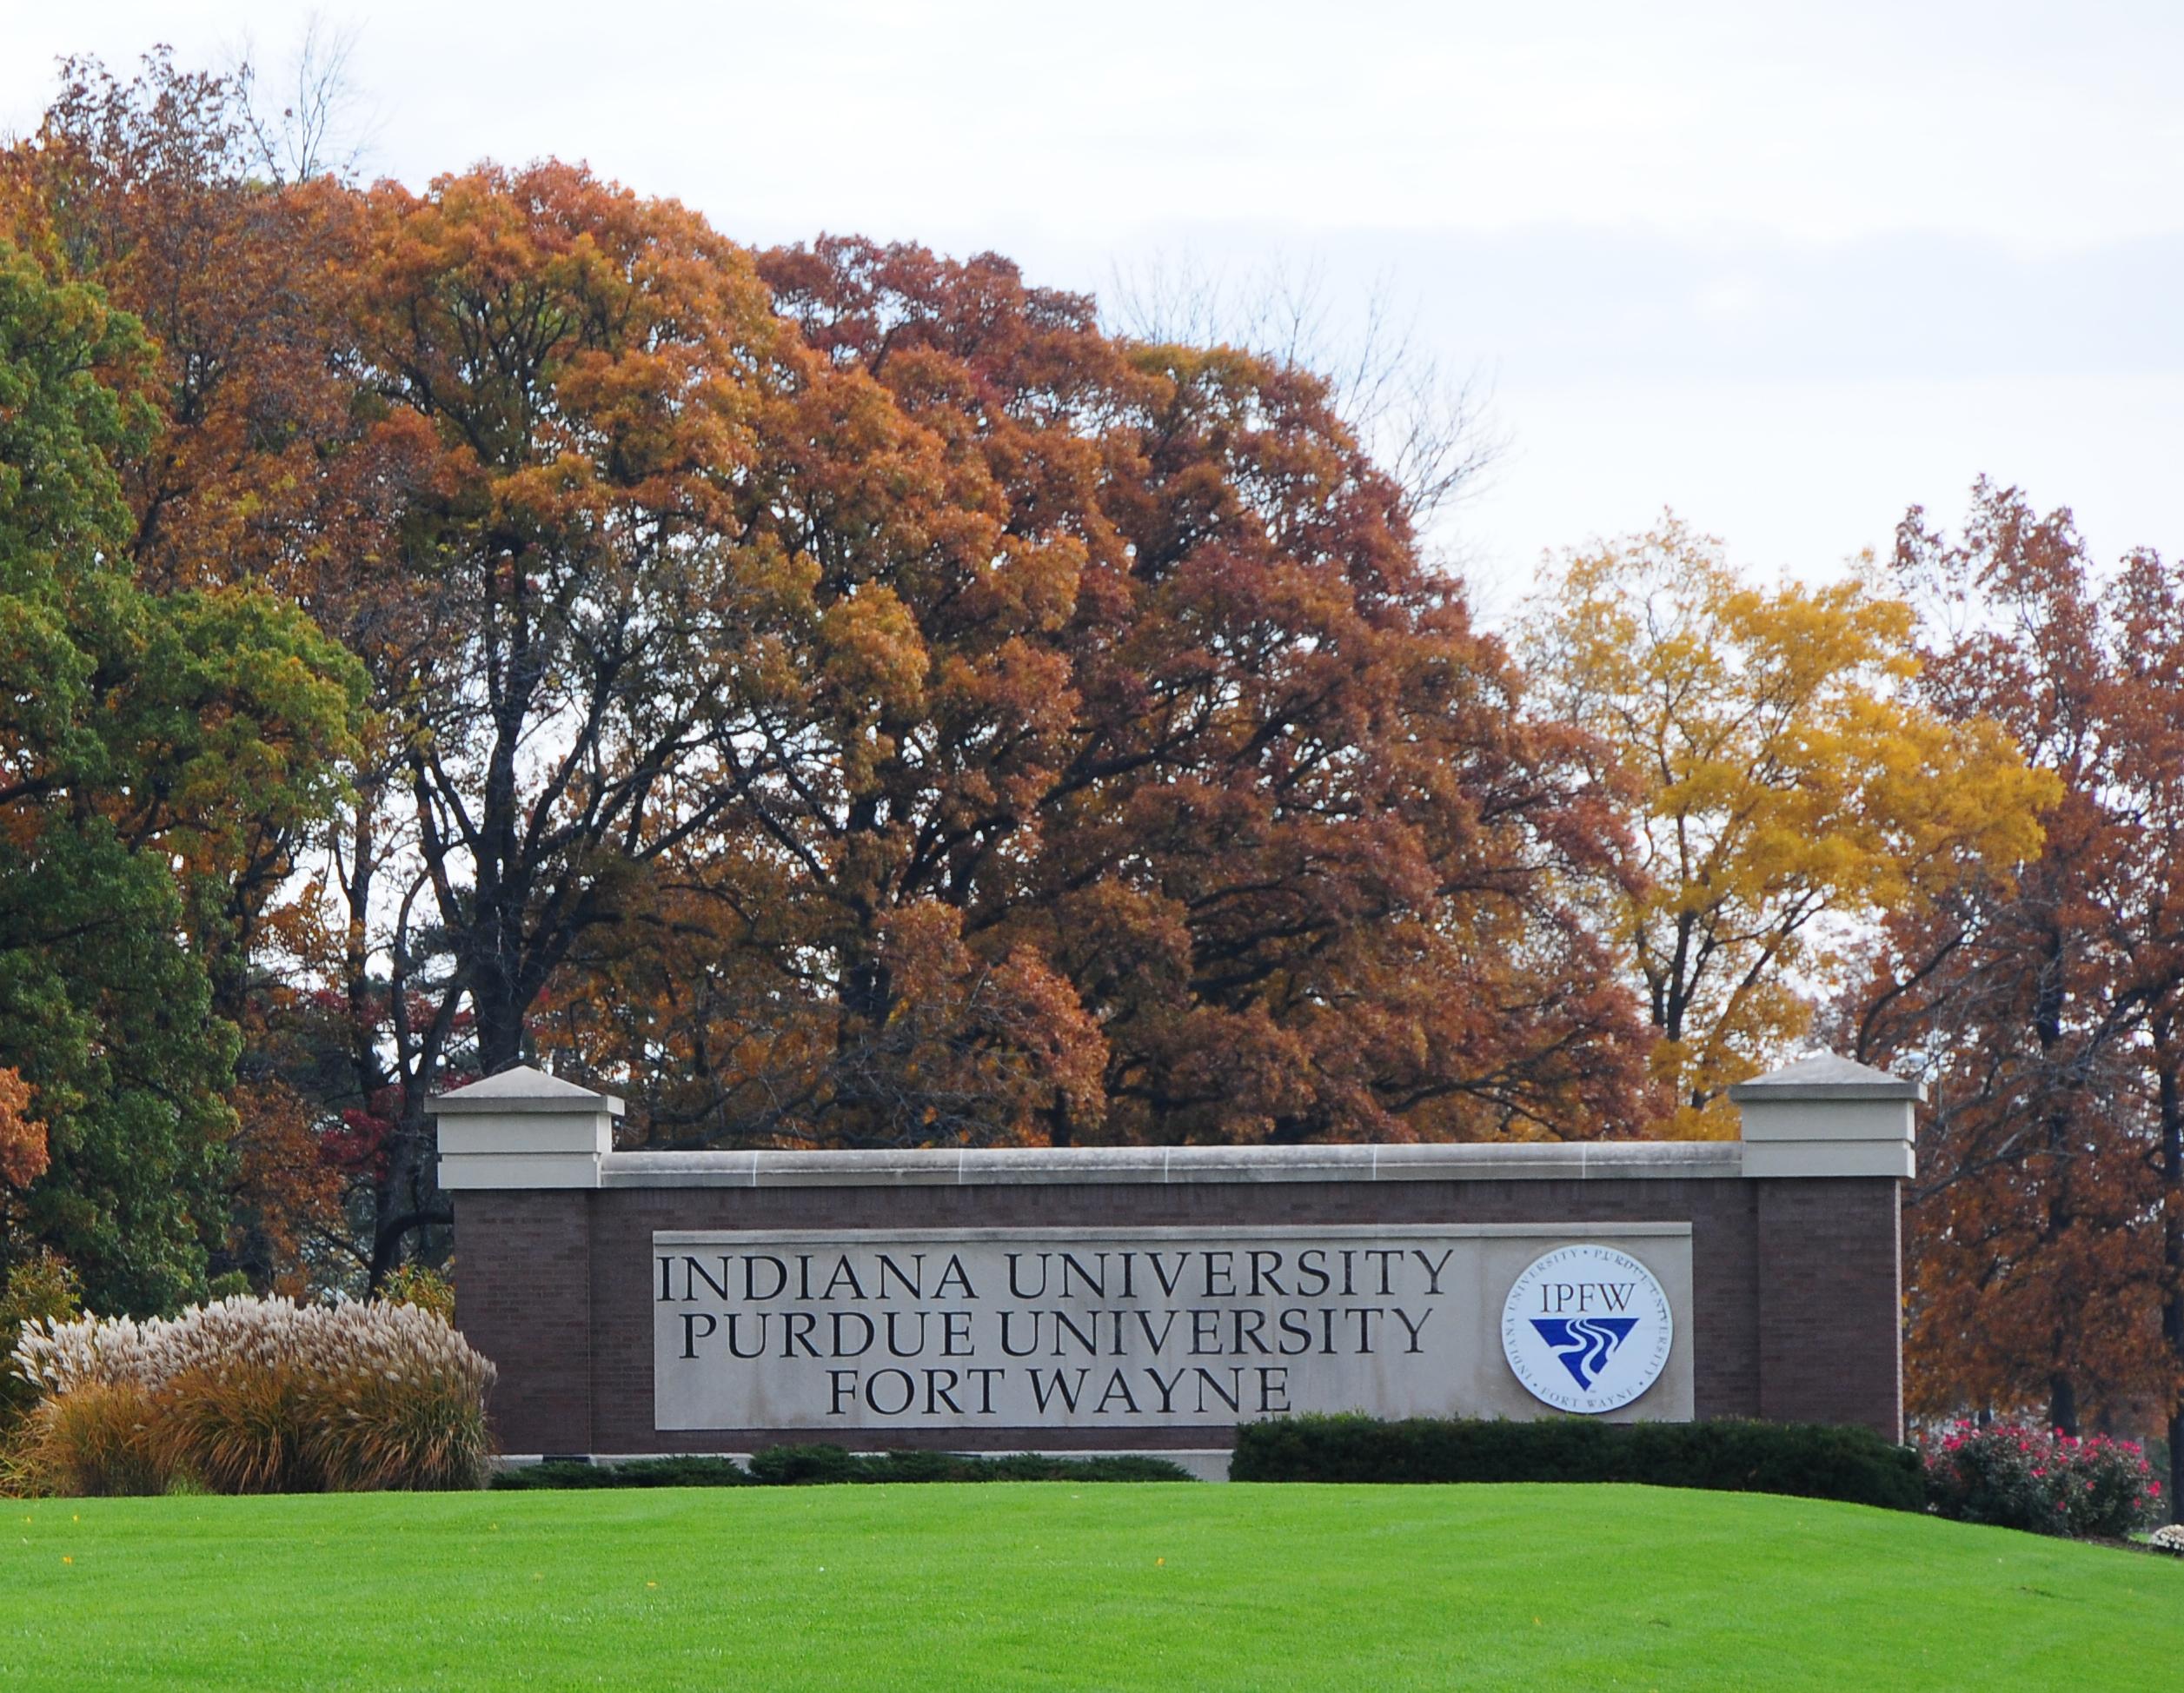 purdue university application deadline for fall 2018